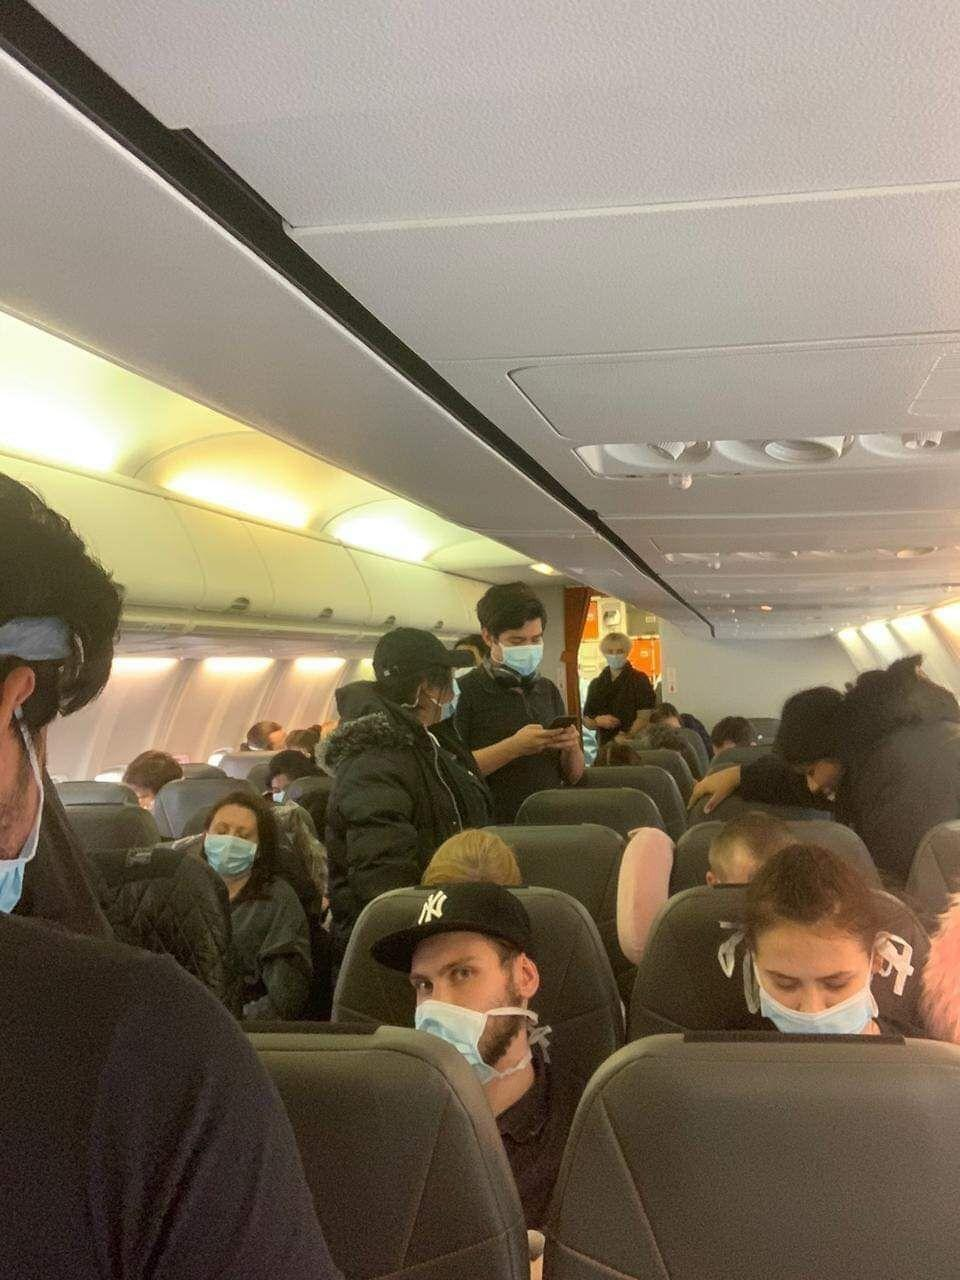 Фото из самолета с украинцами